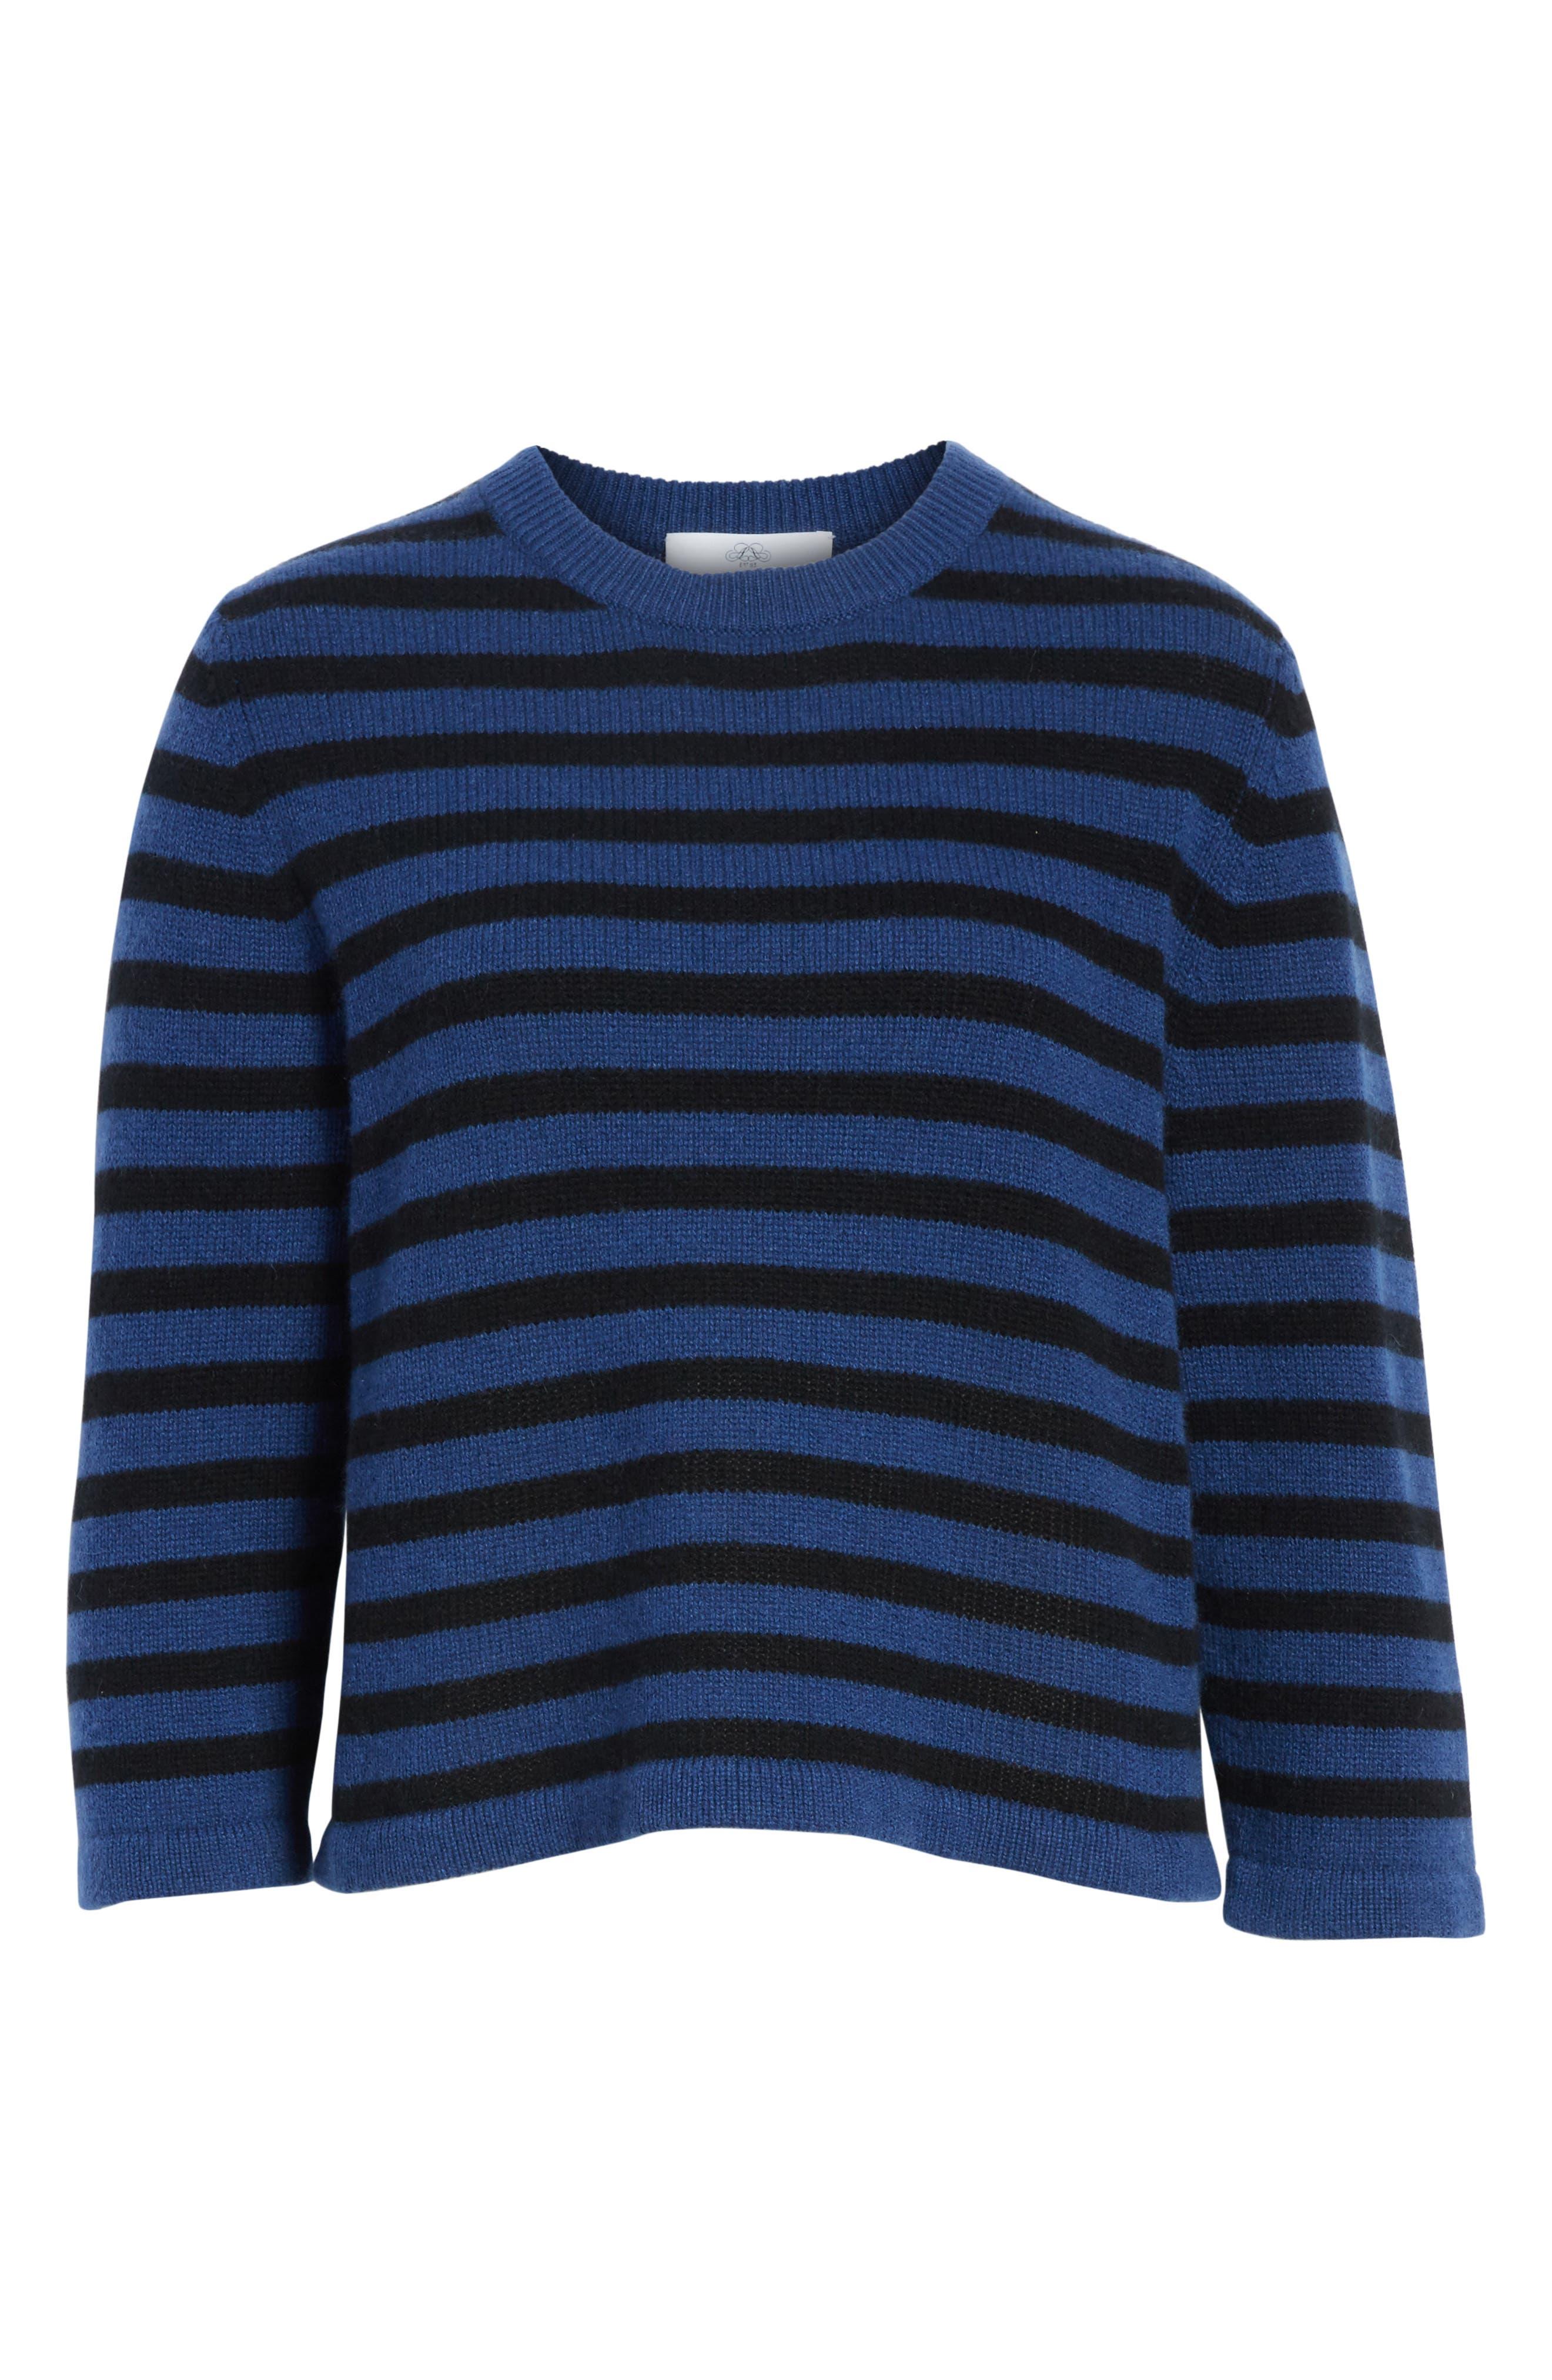 Crop Cashmere Sweater,                             Alternate thumbnail 6, color,                             400